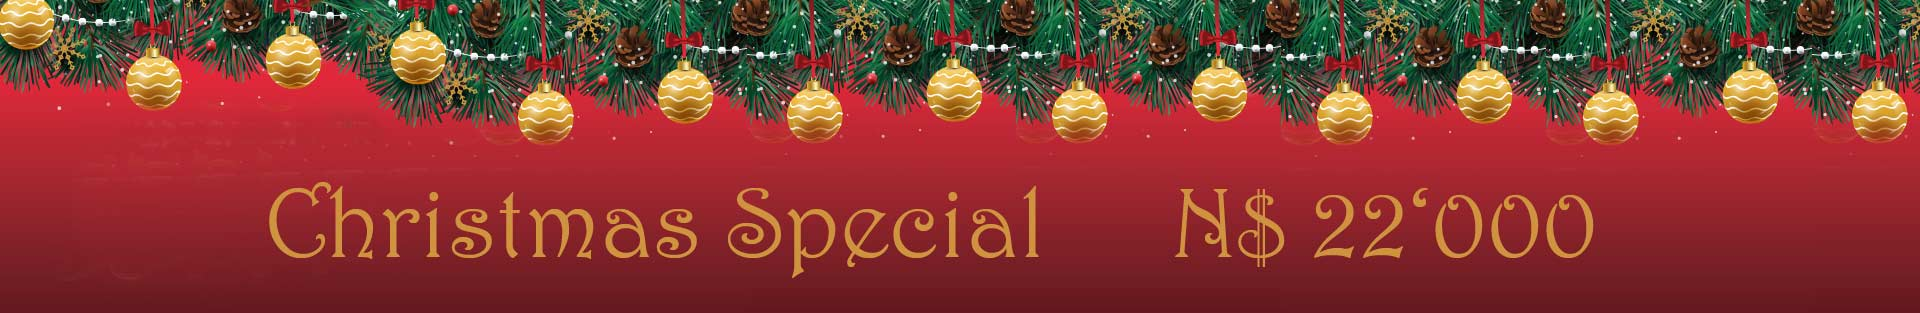 christmas-special.jpg